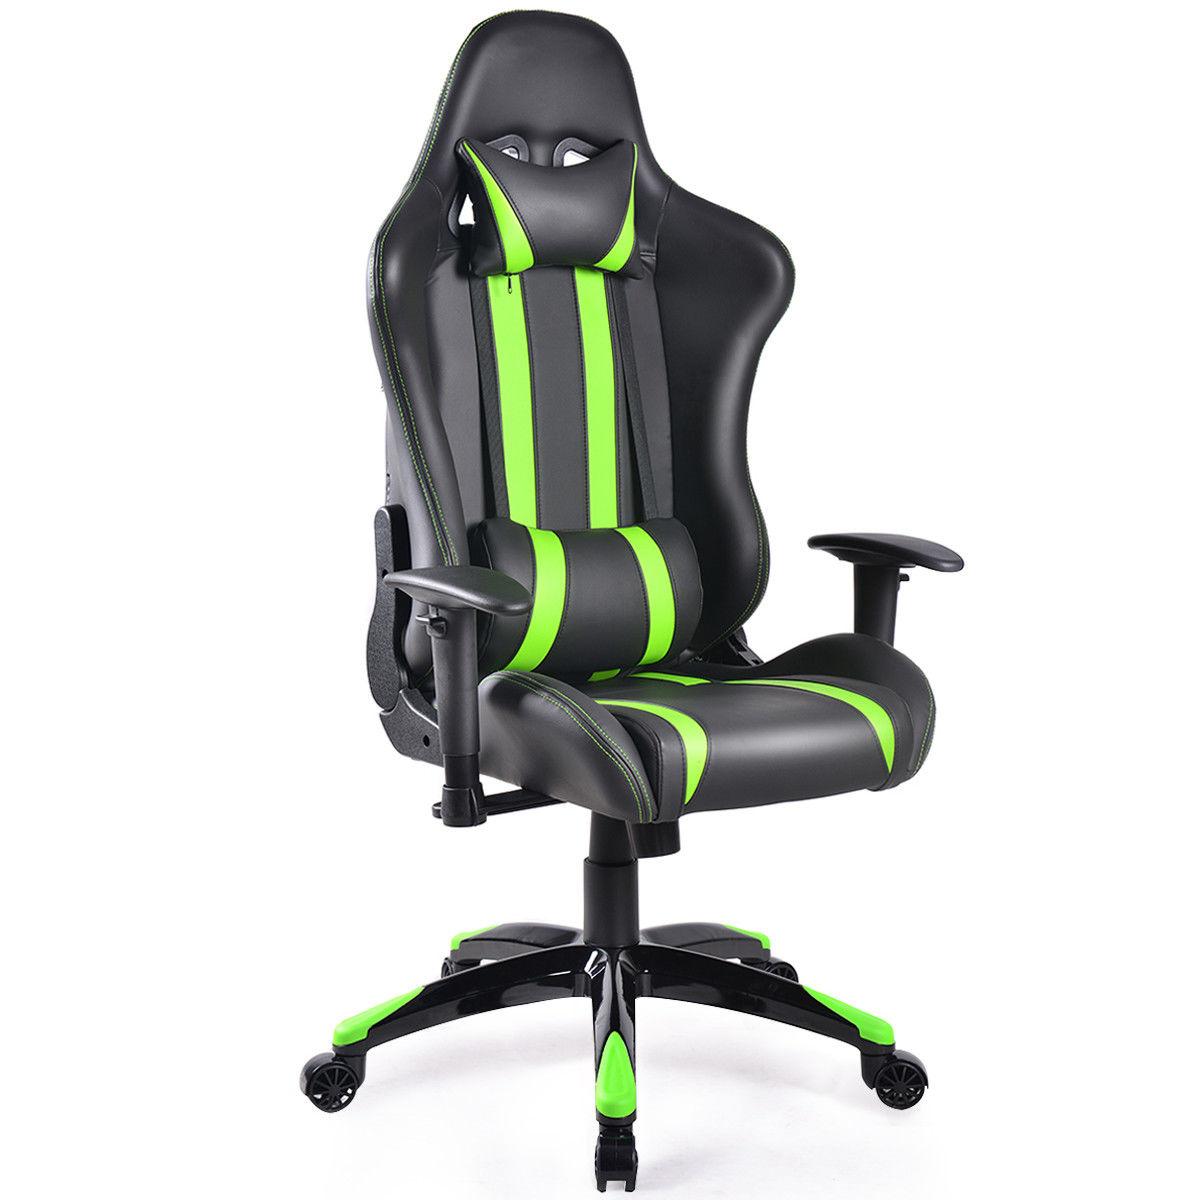 Costway Racing High Back Reclining Gaming Chair Ergonomic